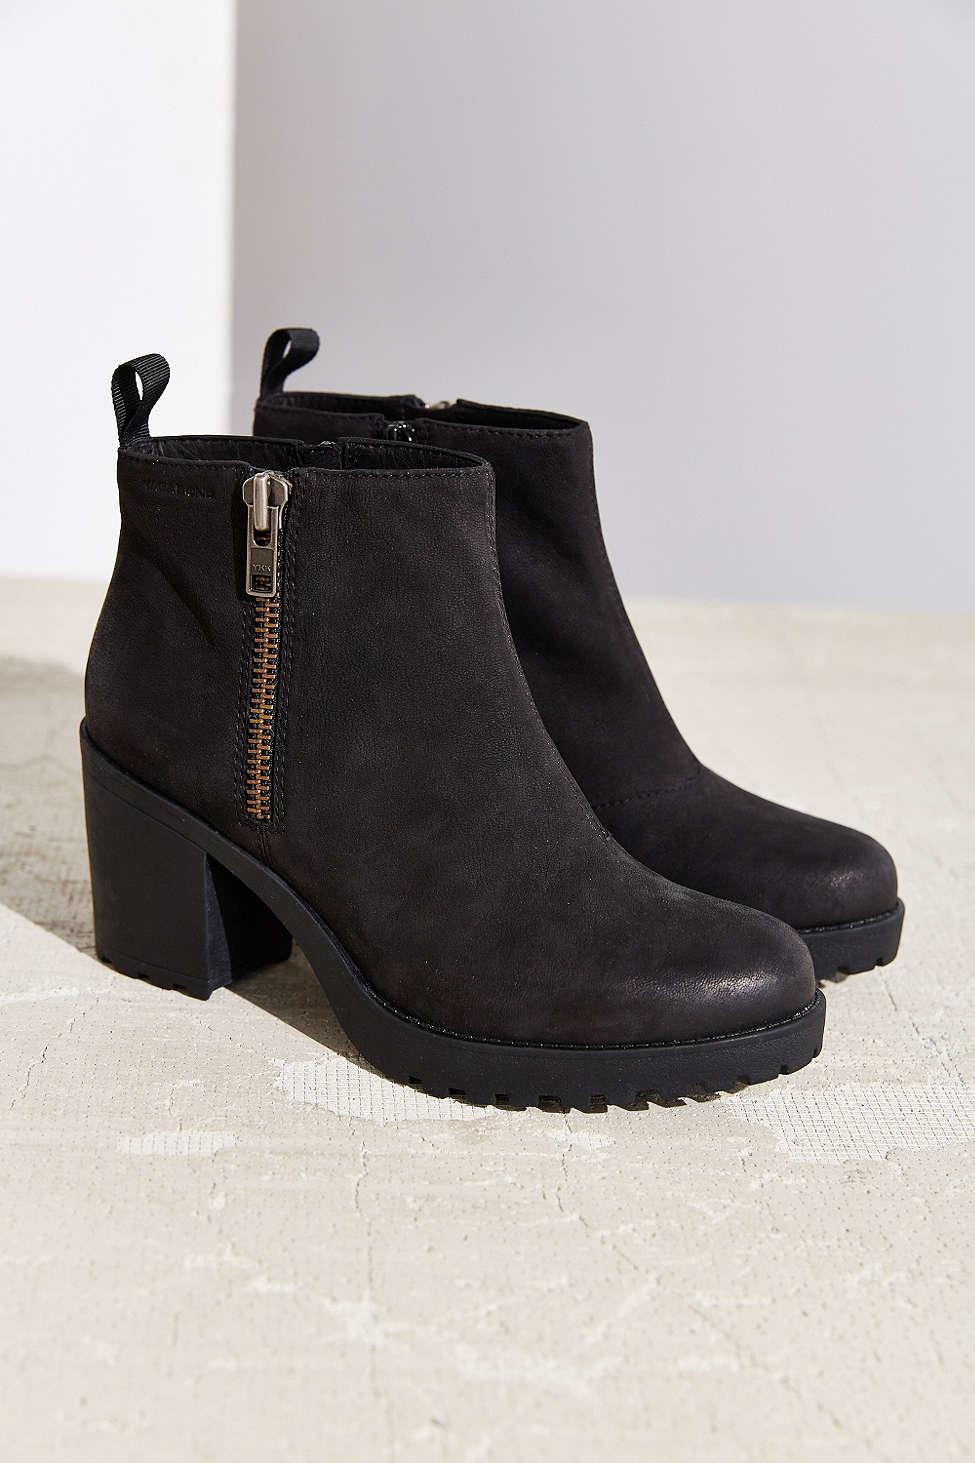 2b281efb5c Lyst - Vagabond Nubuck Grace Double Zip Boot in Black